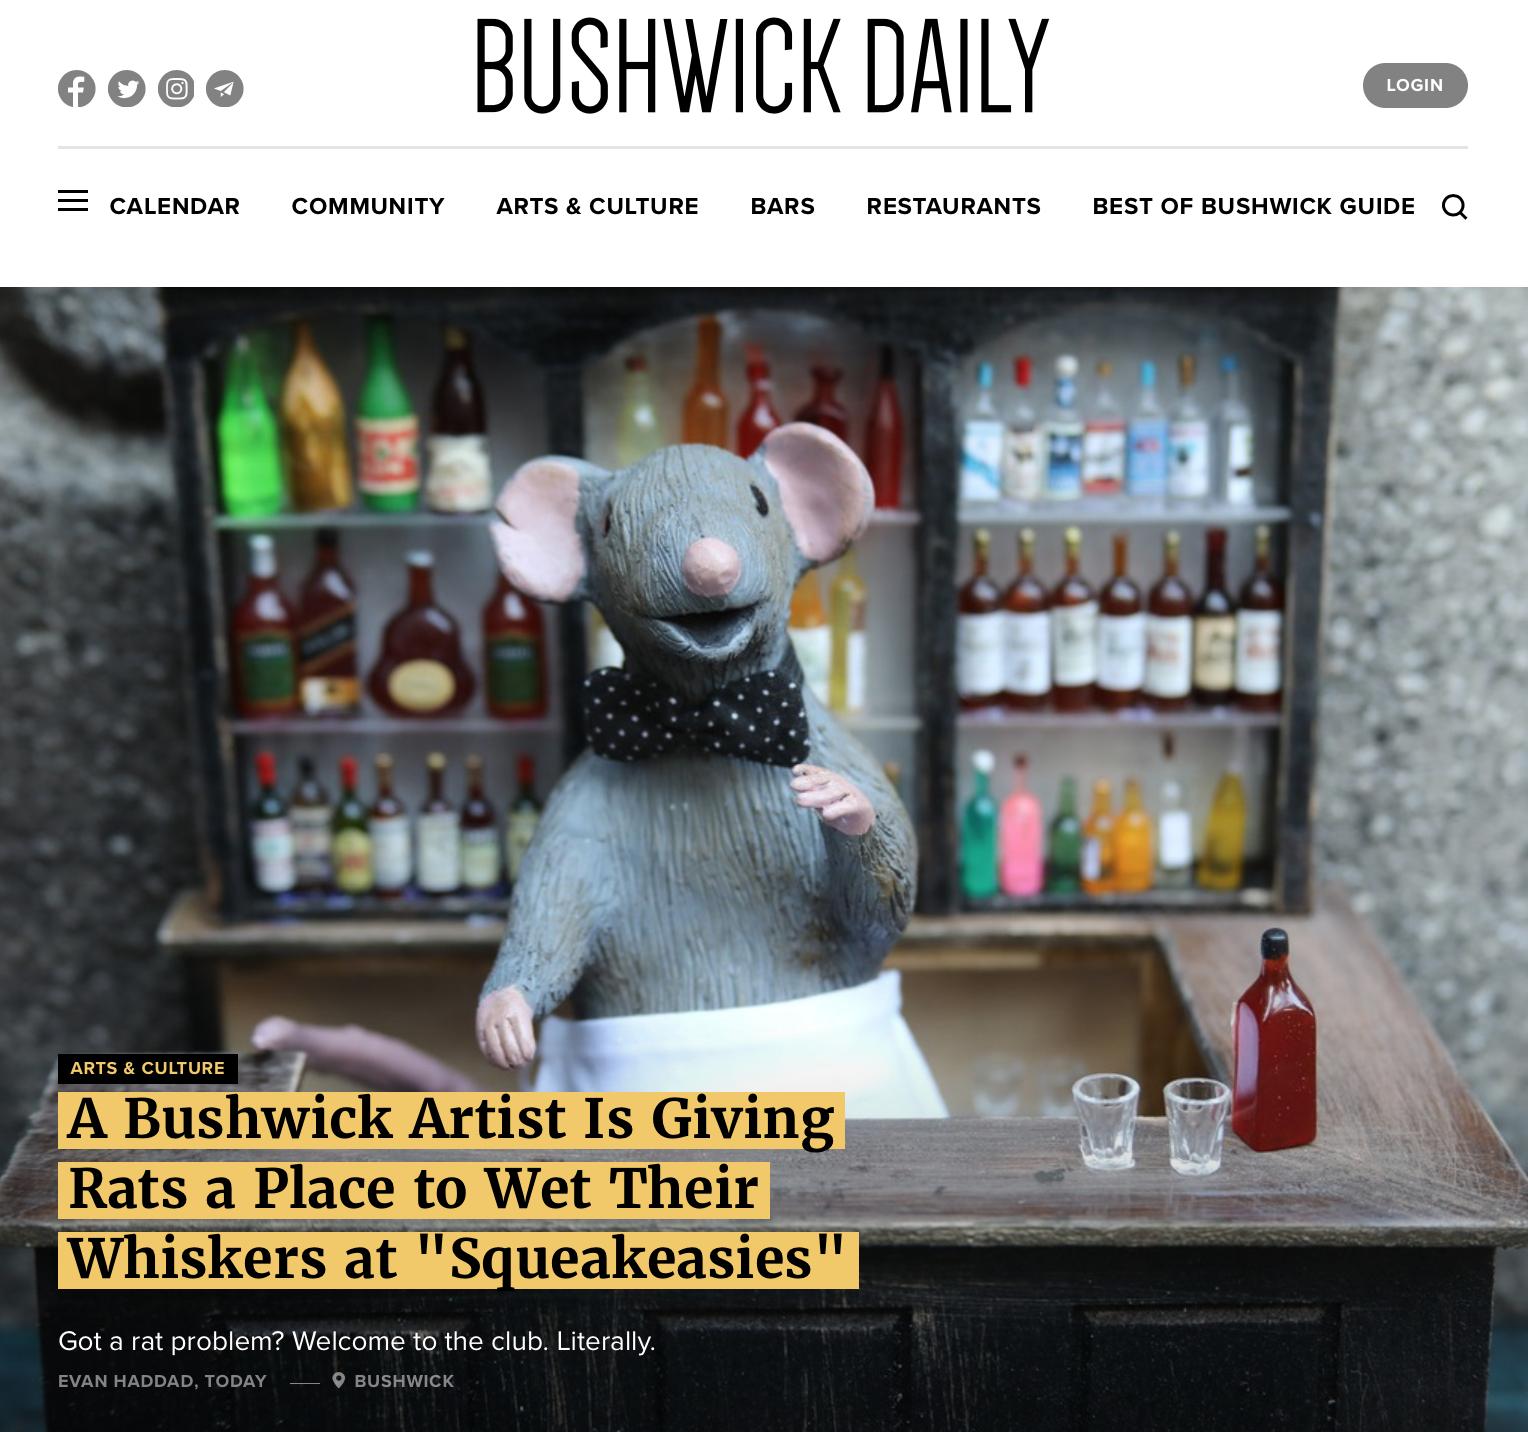 http://bushwickdaily.com/bushwick/categories/arts-and-culture/5069-squeakeasies